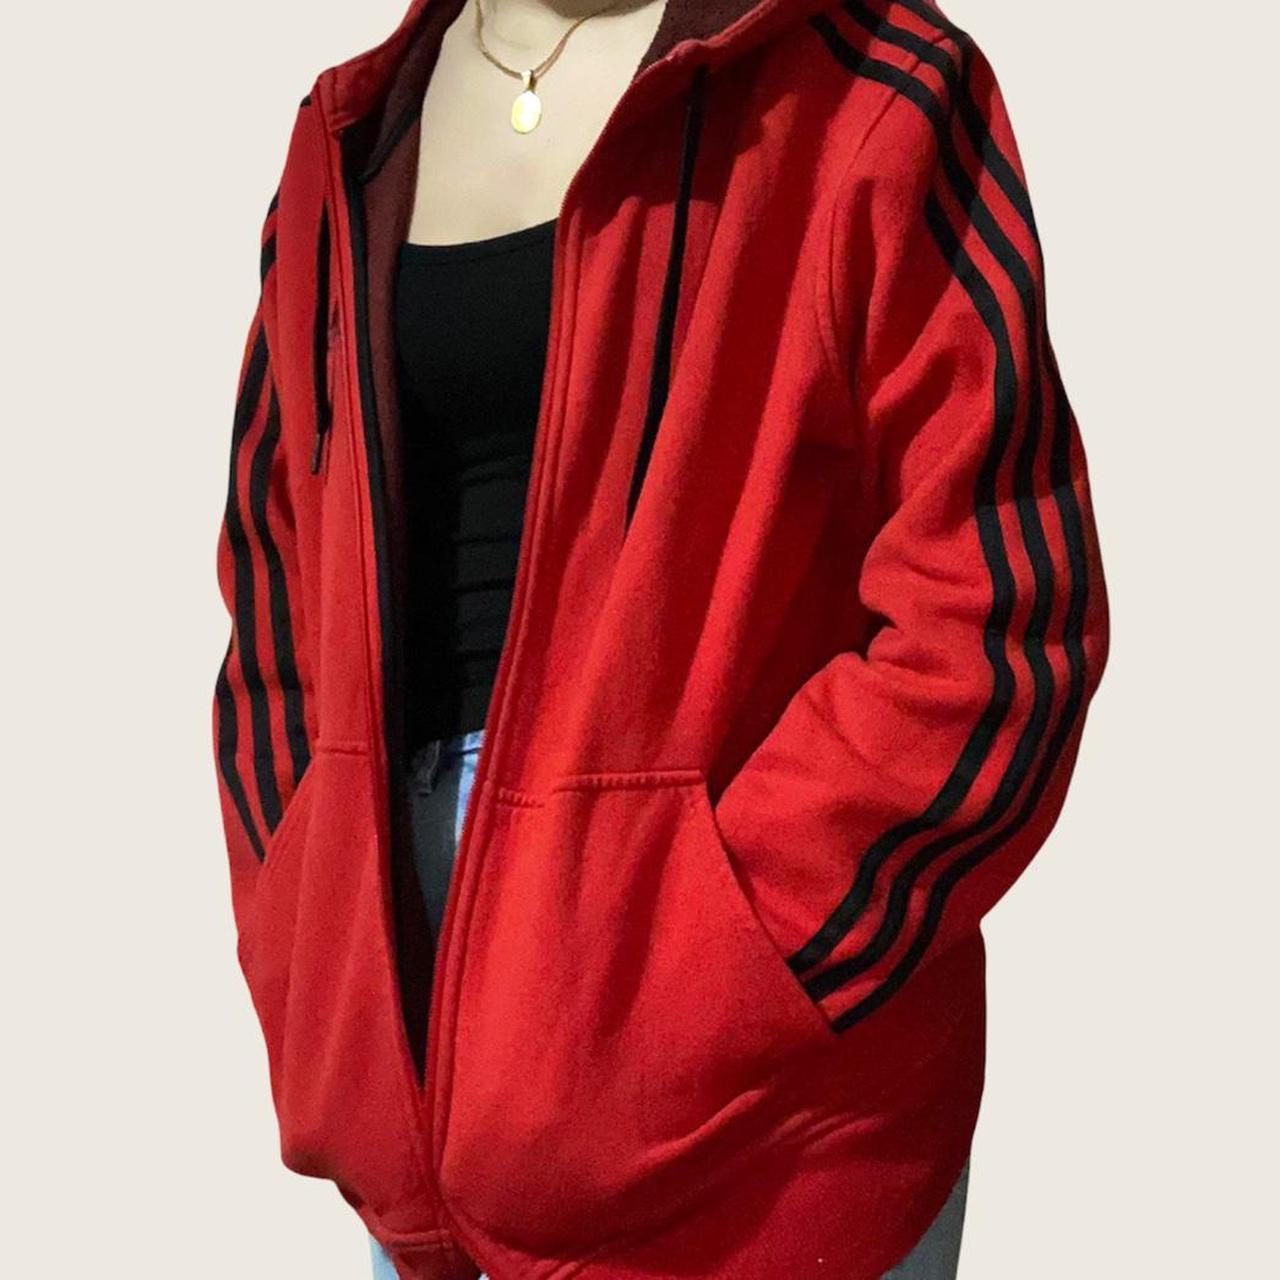 Product Image 1 - Adidas Hoodie Large Red/Black  #adidas #sweatshirt #3stripes